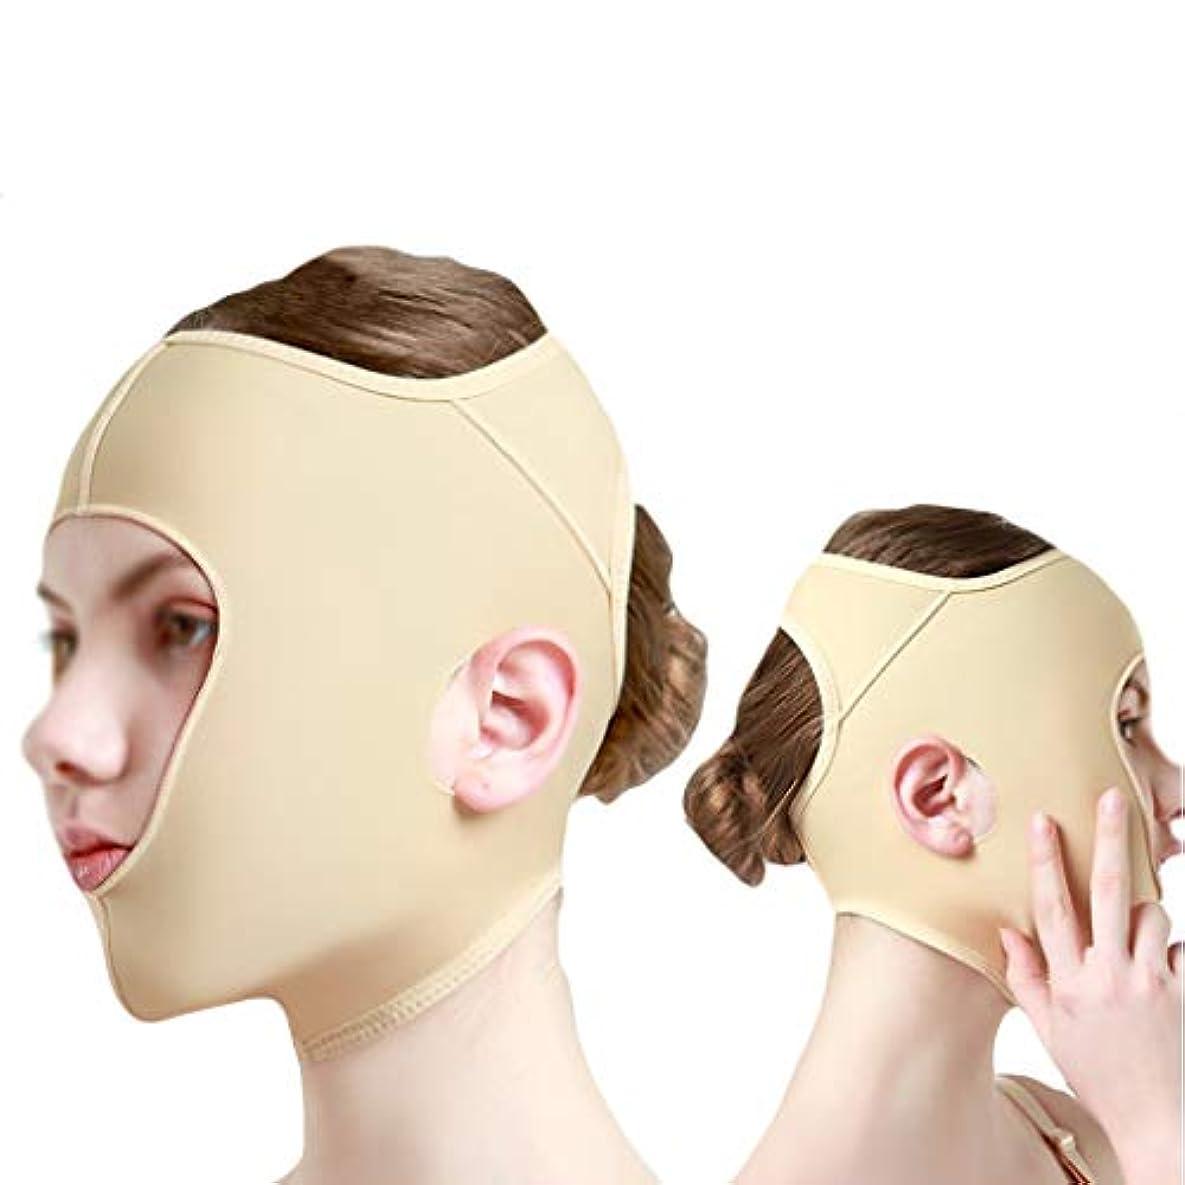 XHLMRMJ 顔の彫刻ツール、脂肪吸引フード、二重あご包帯、ストレッチマスク (Size : M)